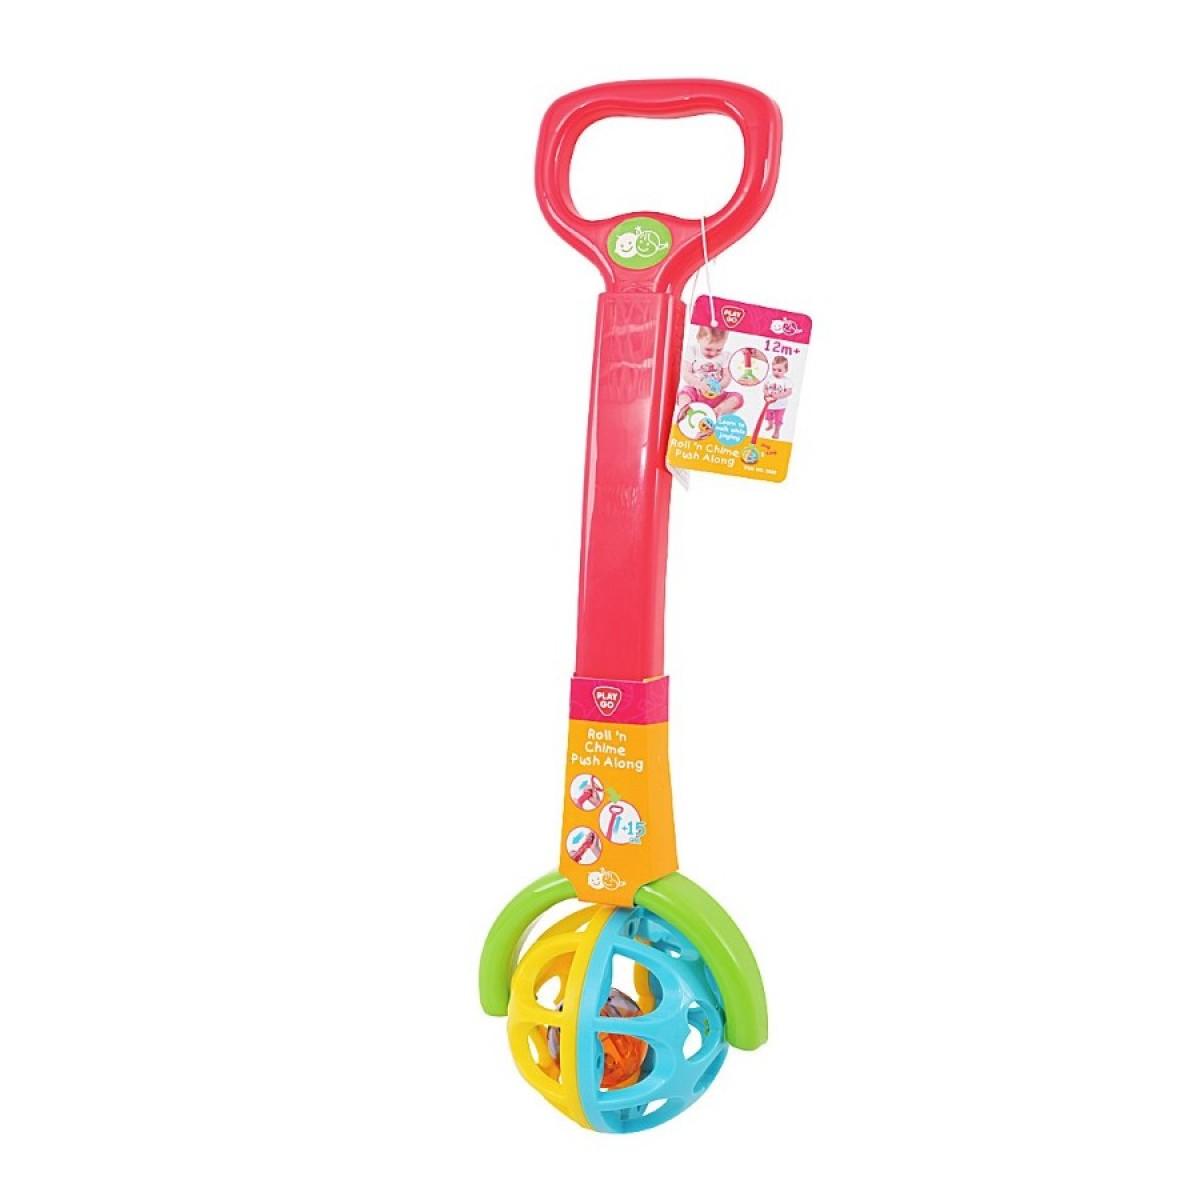 Incredible Playgo Roll Chime Push Along Toys Caseys Toys Creativecarmelina Interior Chair Design Creativecarmelinacom